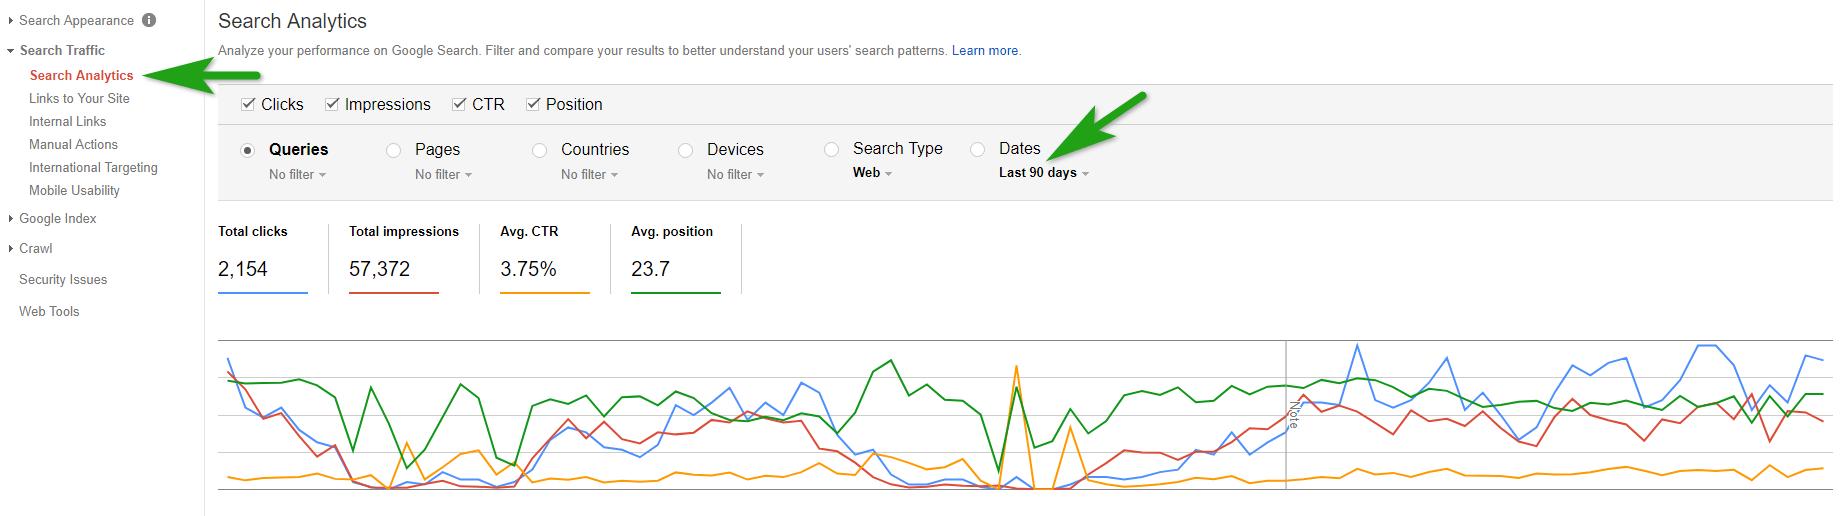 huong-dan-su-dung-google-search-console-8